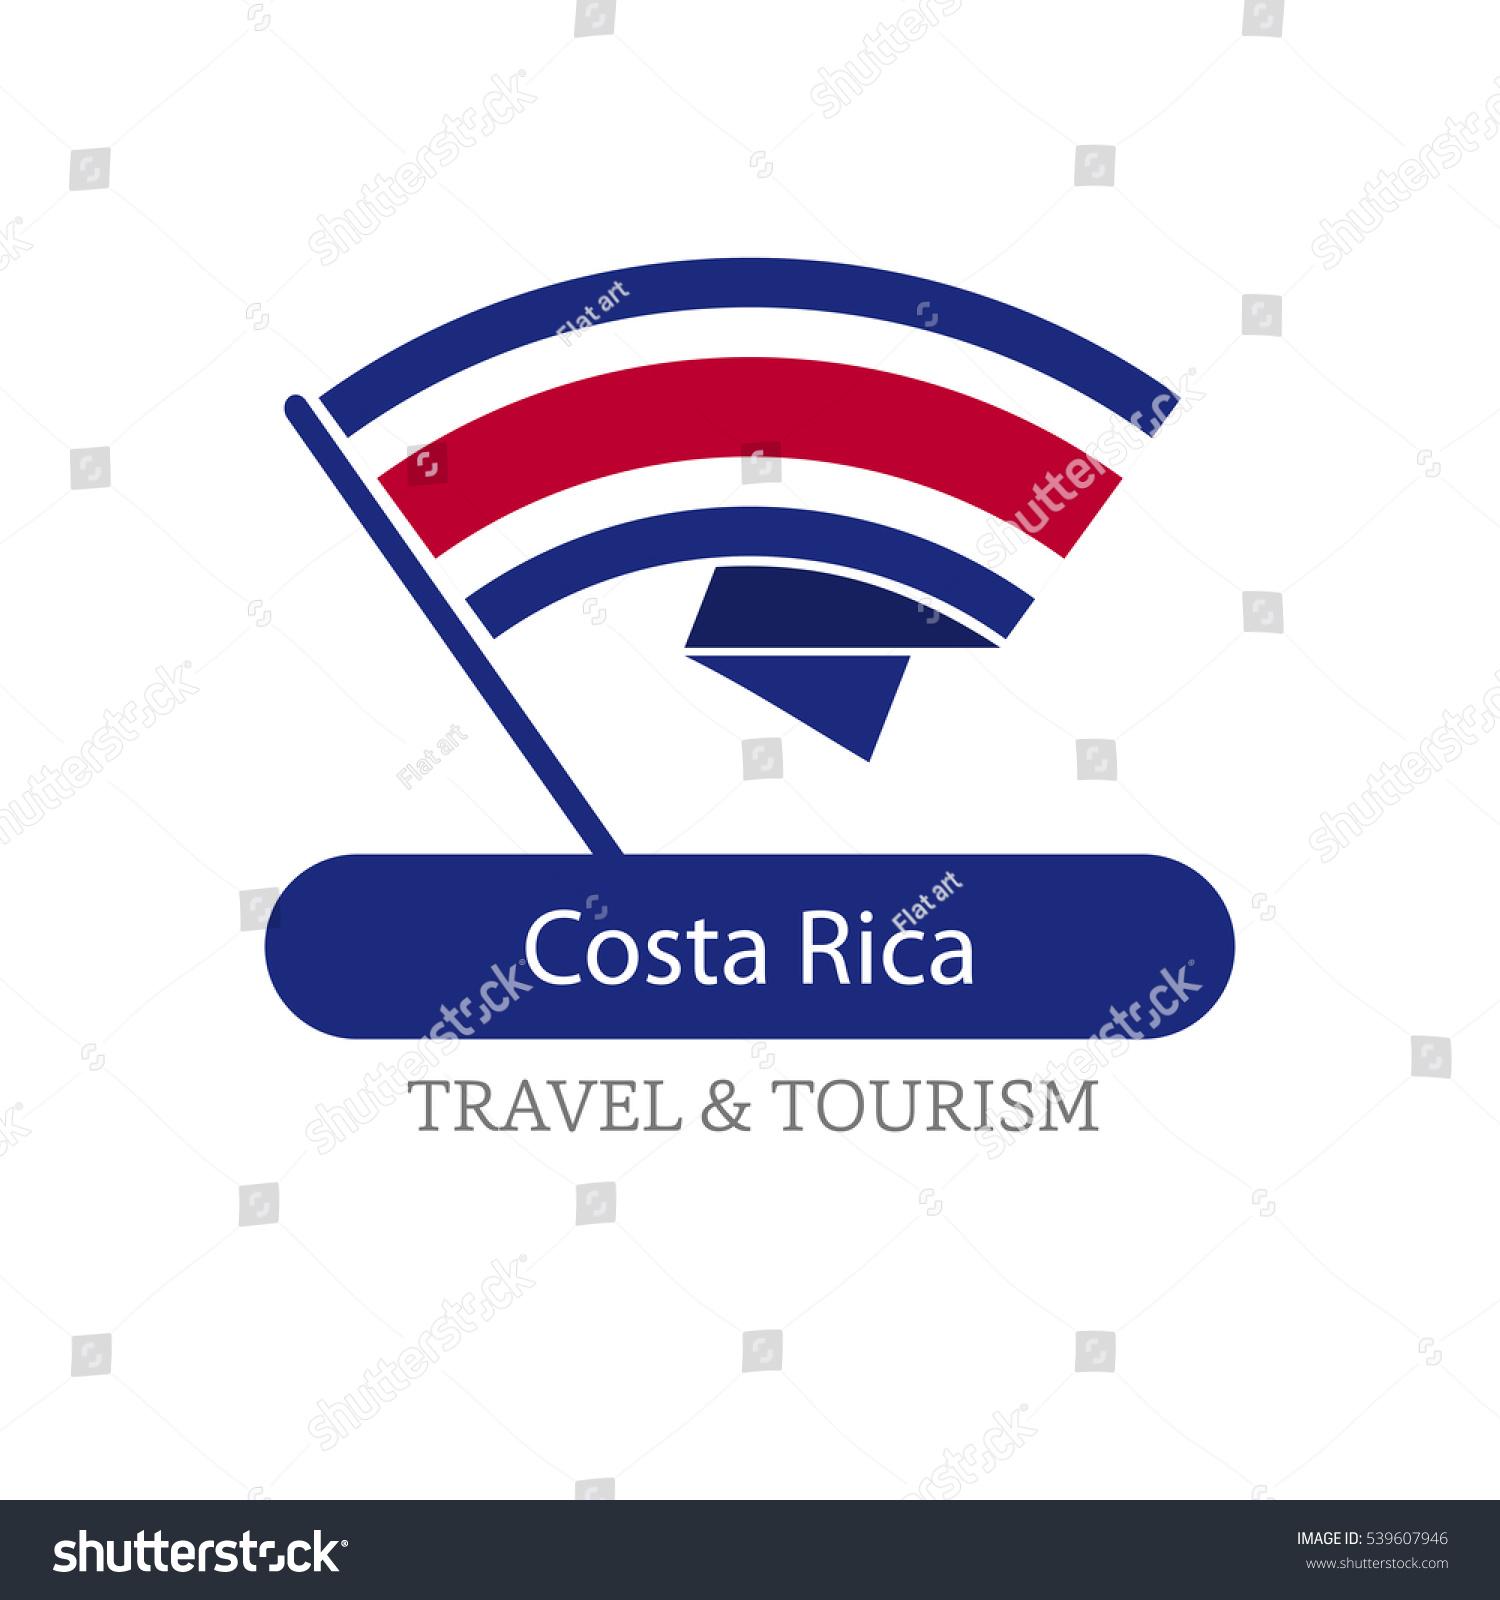 Costa rica travel destination logo vector stock vector 539607946 costa rica the travel destination logo vector travel company logo design country flag travel biocorpaavc Gallery